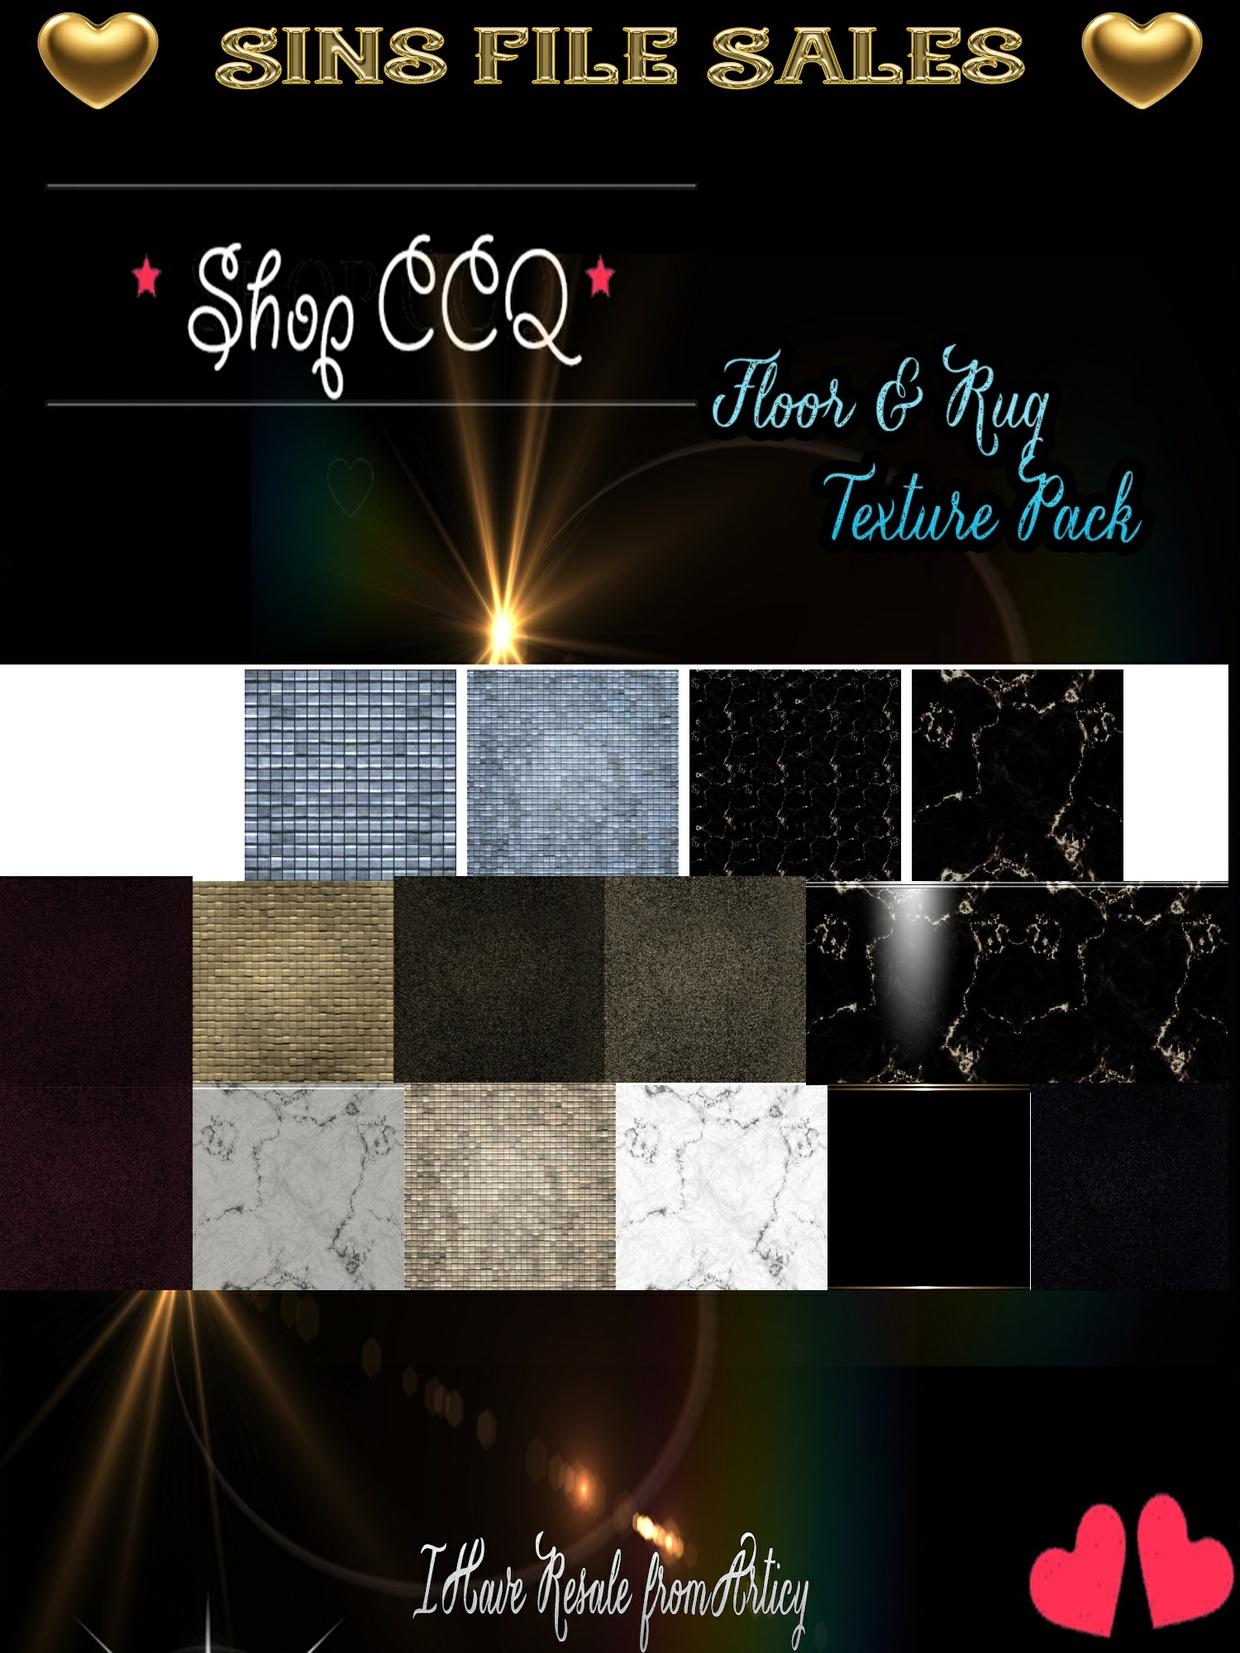 Floor & Rug Texture Pack